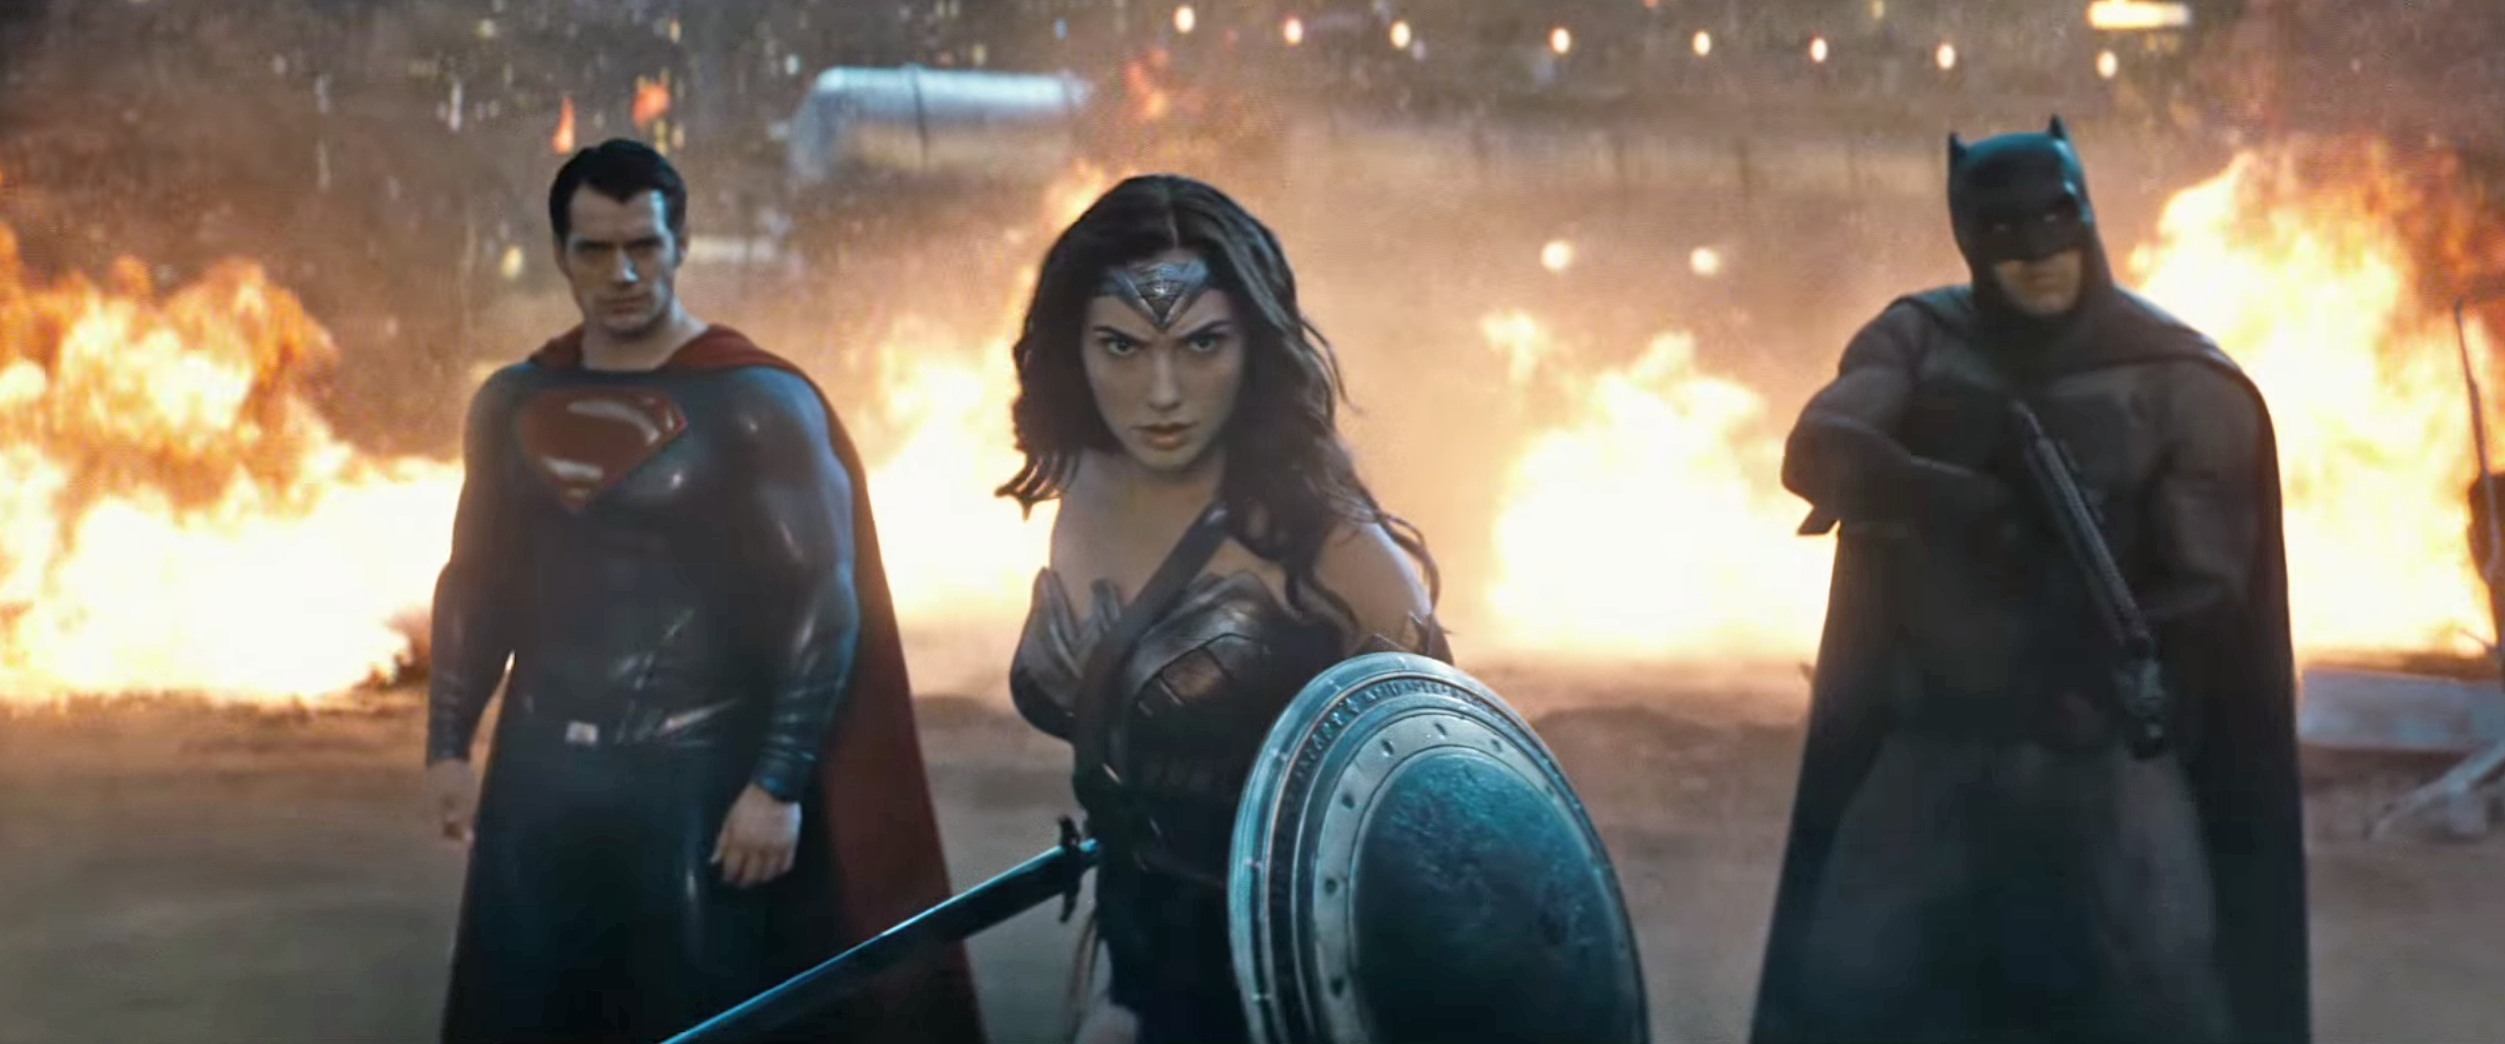 Superman, Mulher Maravilha e Batman